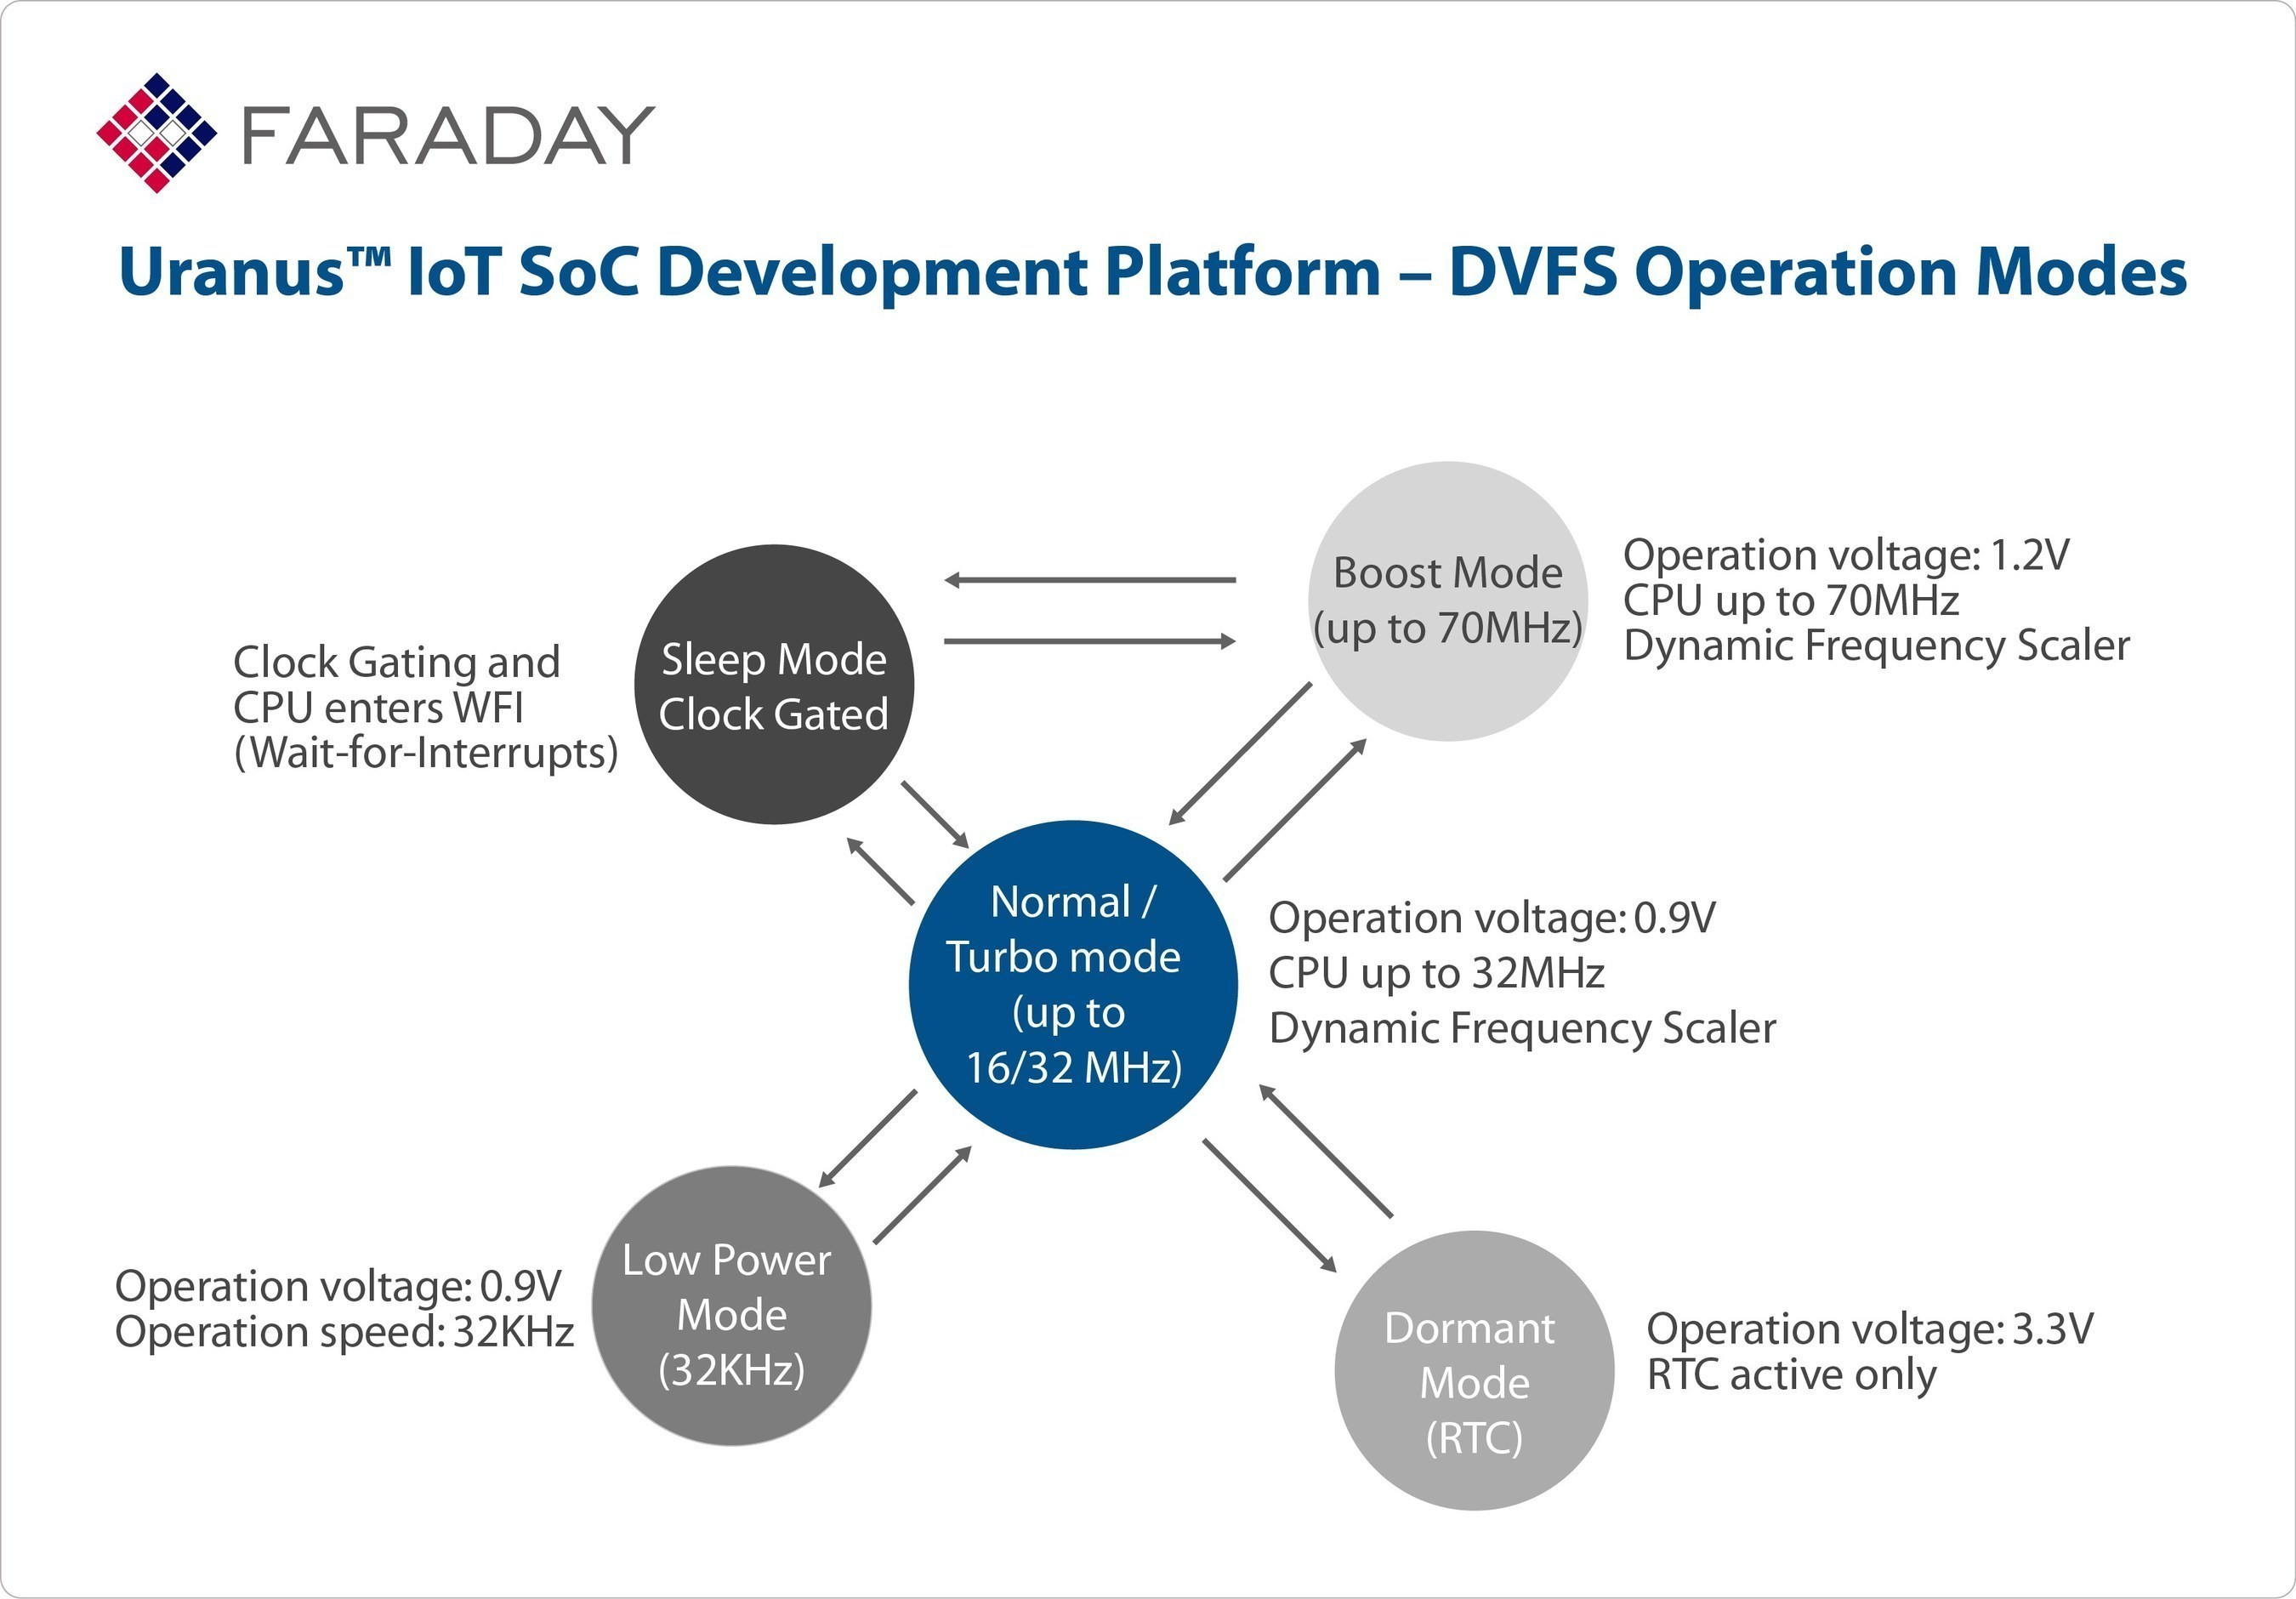 Faraday Uranus IoT SoC Development Platform - DVFS Operation Modes